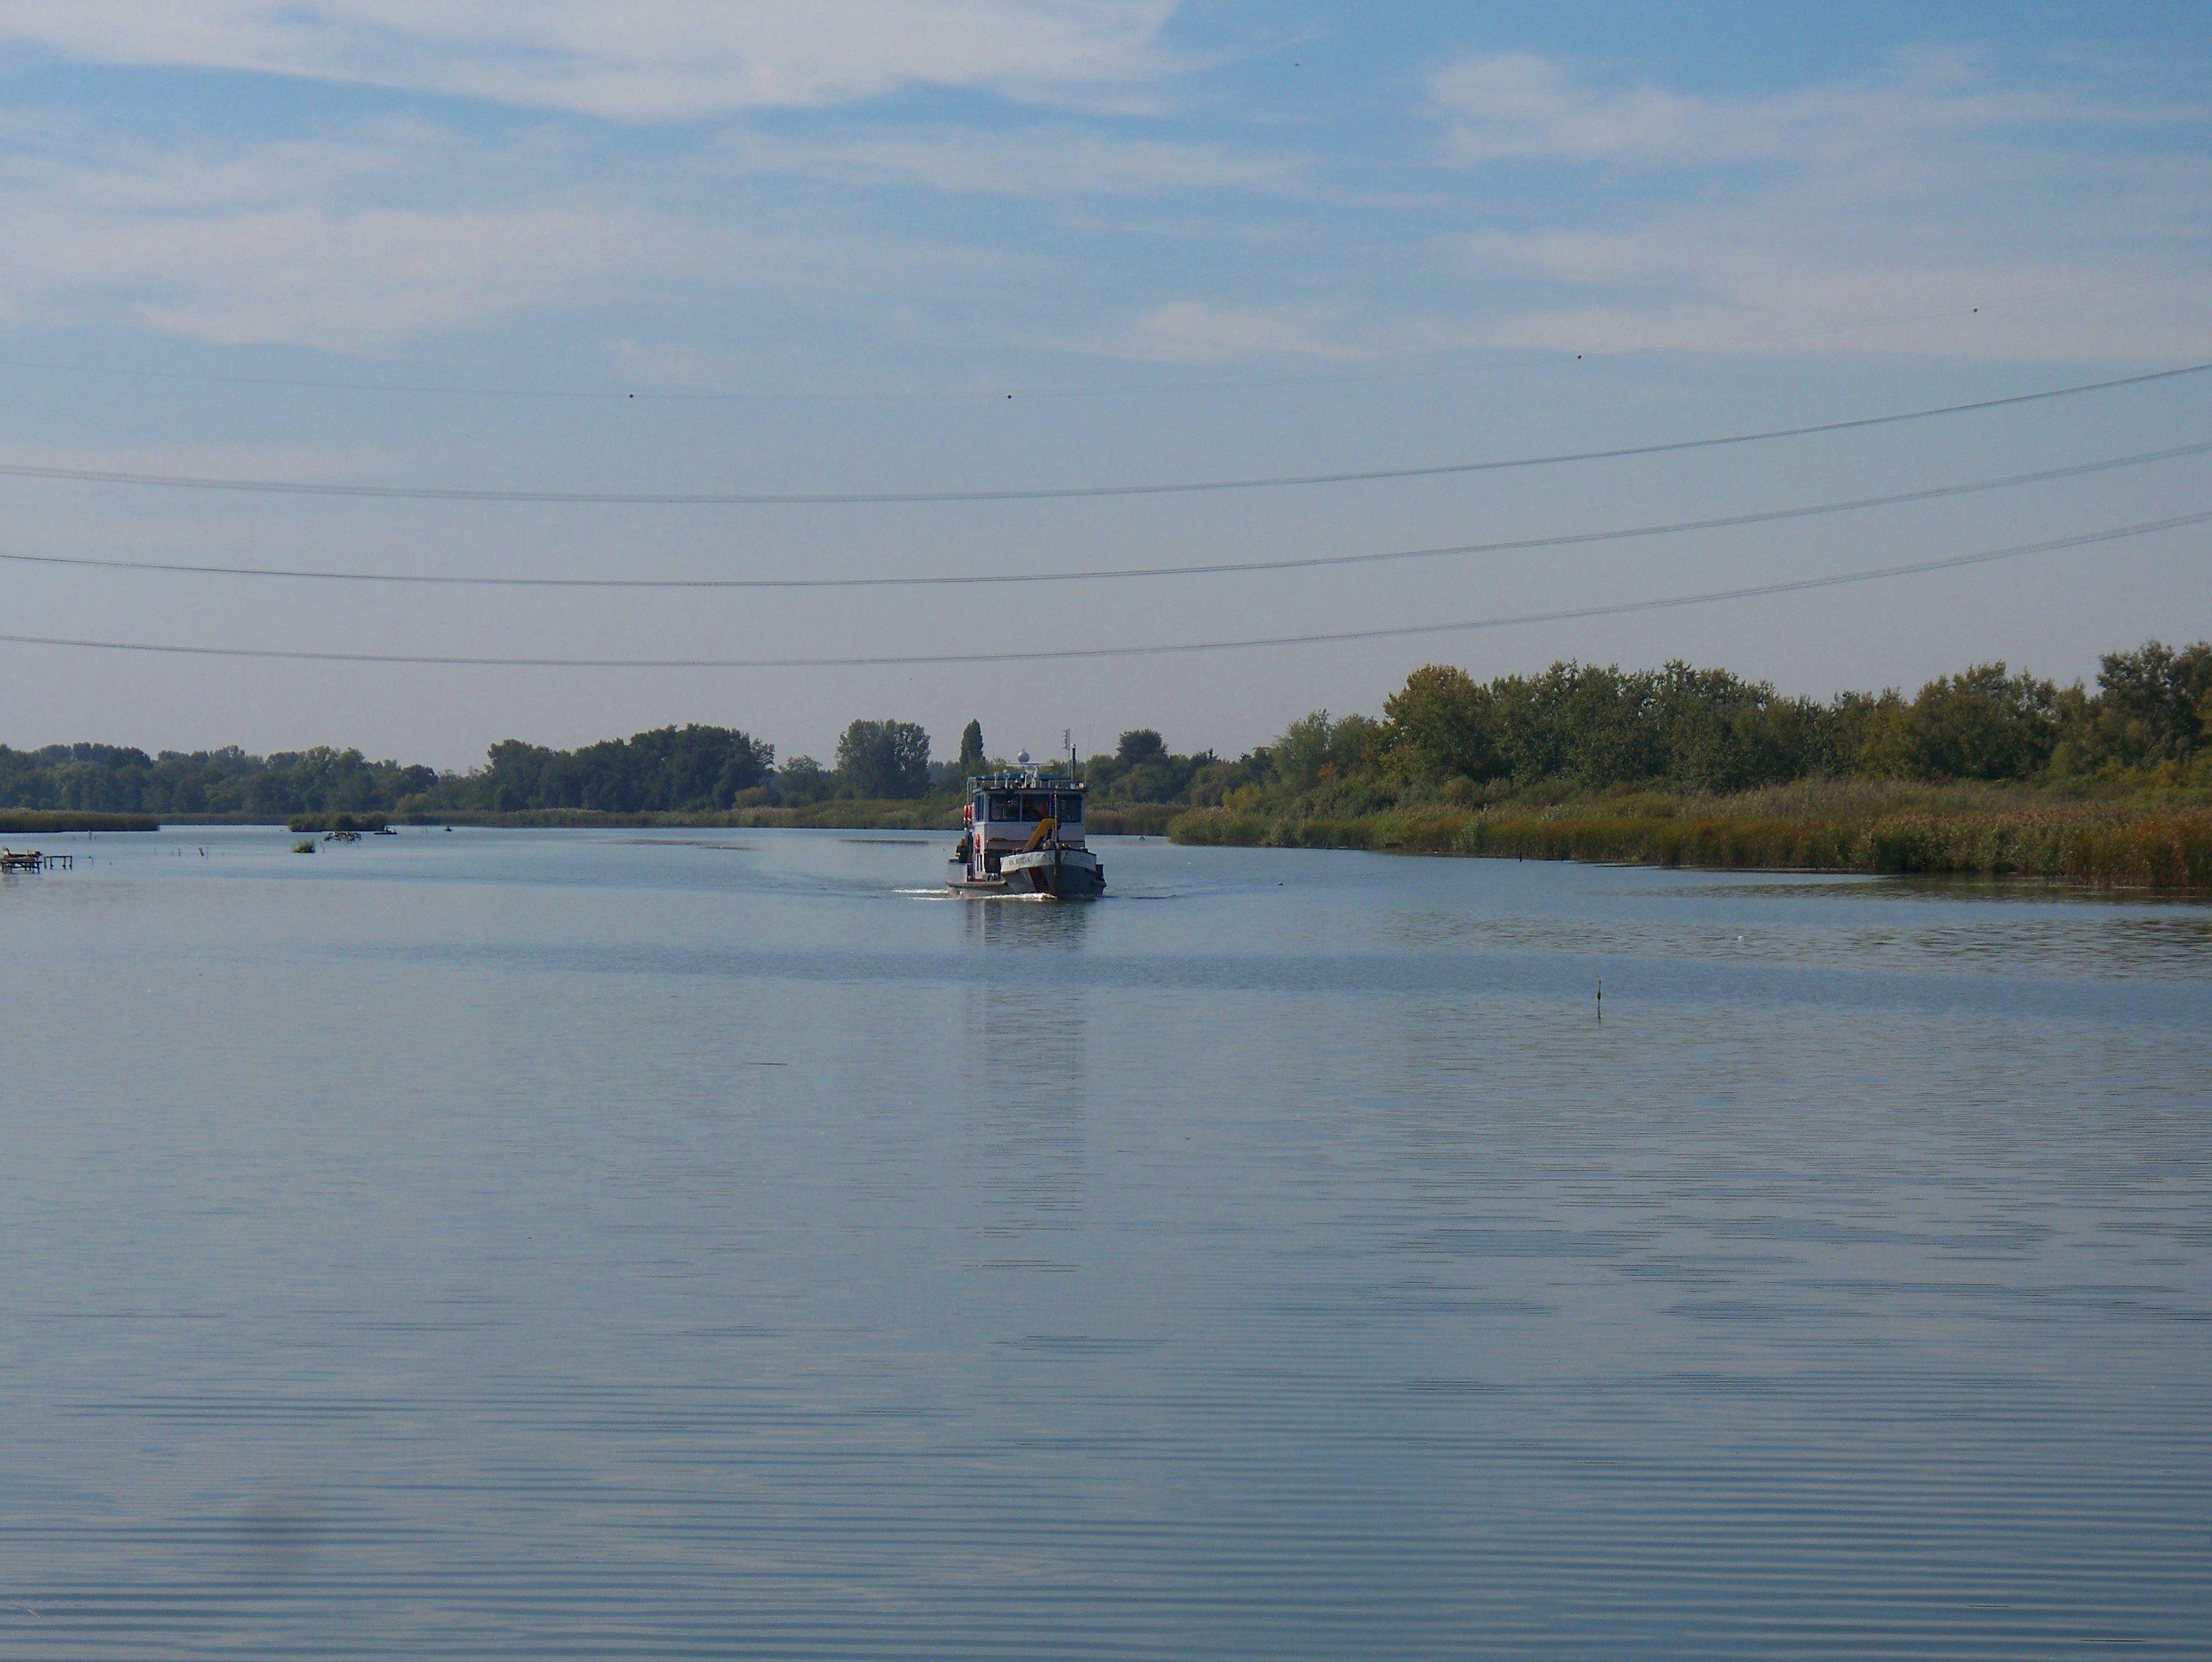 http://www.kisdunainagyhajok.hu/egyebhajok/2011_09_30_kituzo-iii_motorhajo_majoshazanal/2011_09_30_kituzo-iii_motorhajo_majoshazanal_003.jpg